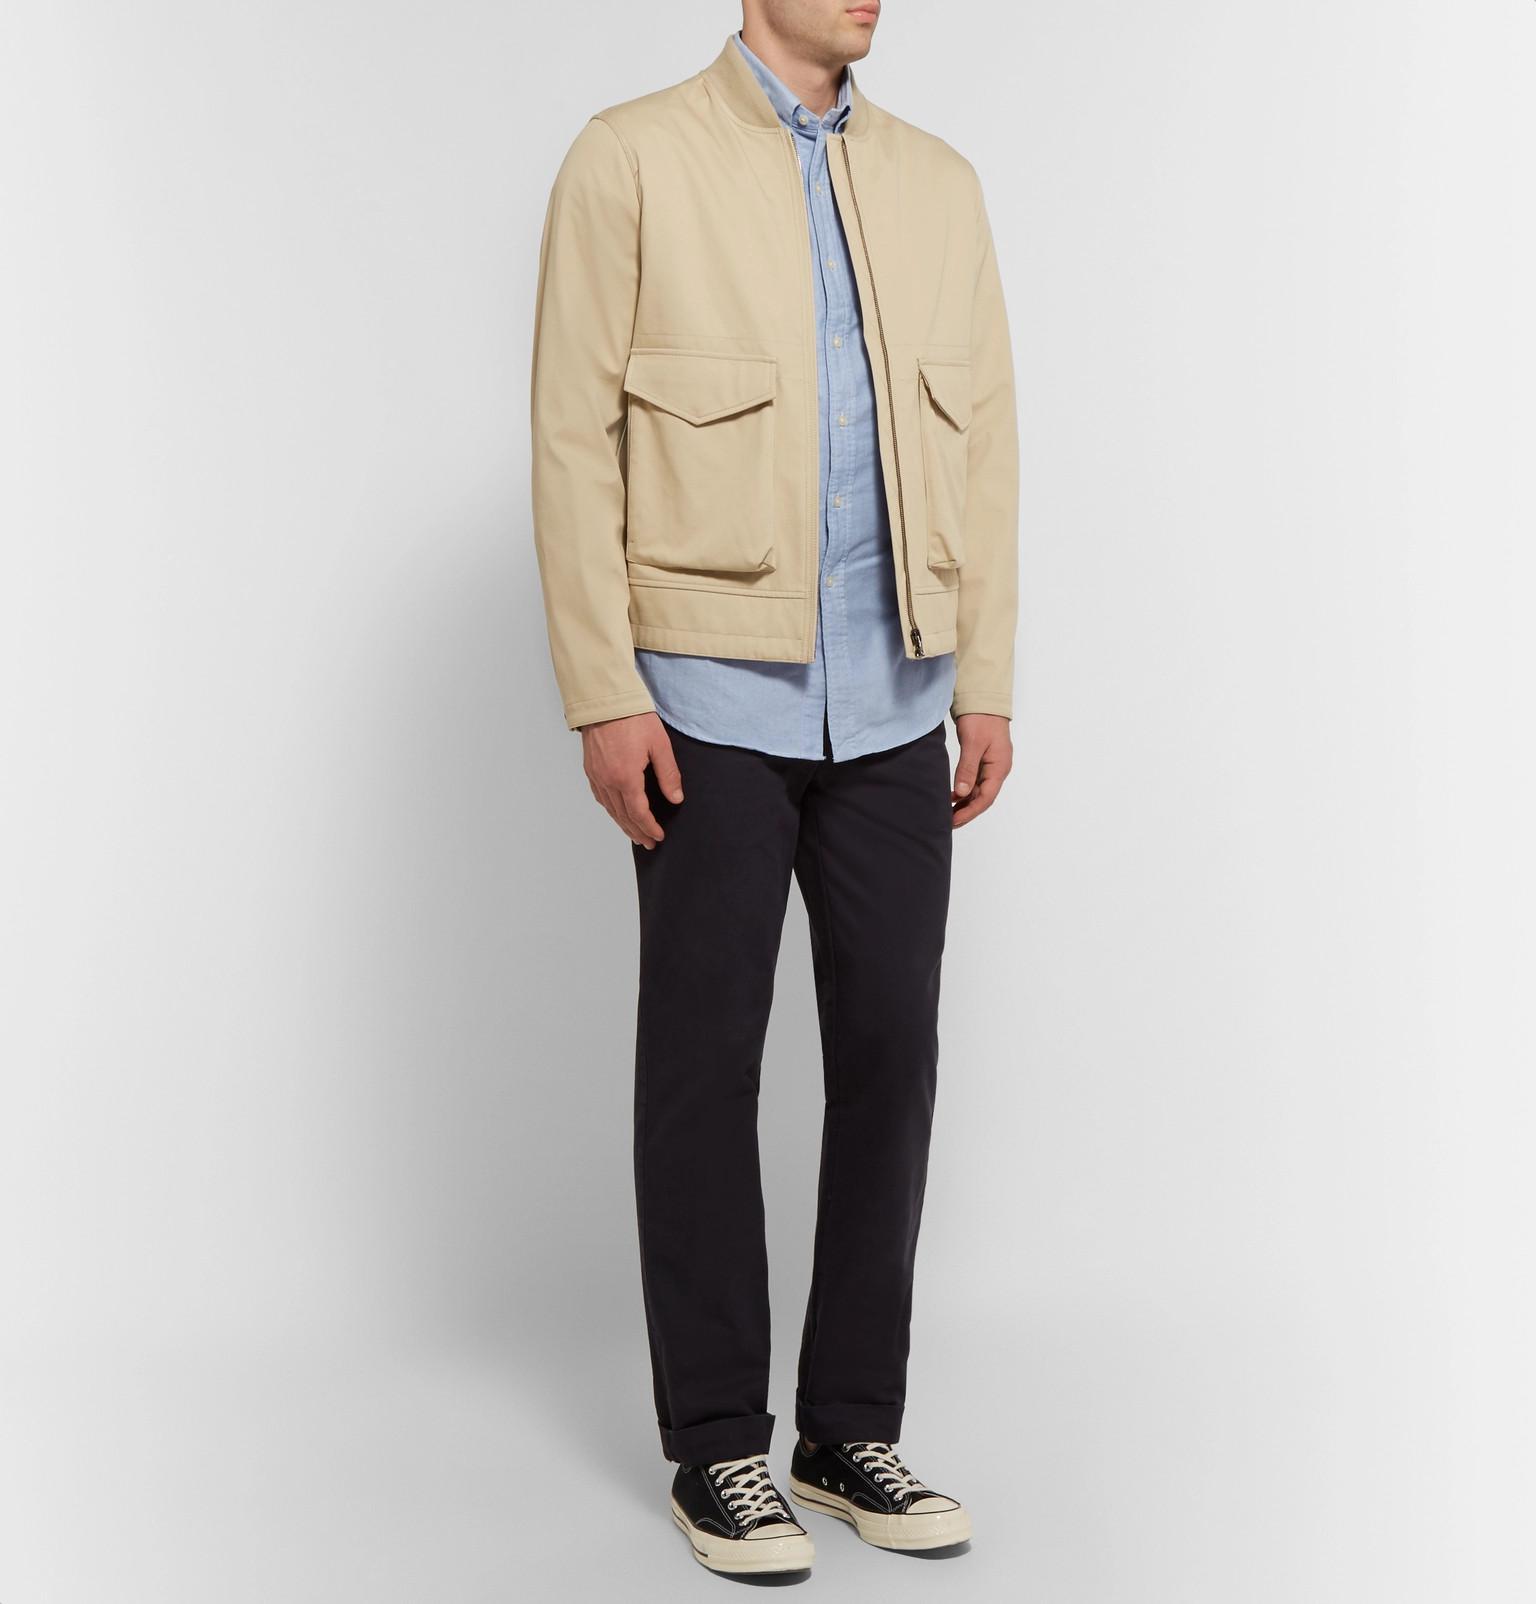 635ec34e7148e4 Polo Ralph Lauren - Blue Slim-fit Cotton Oxford Shirt for Men - Lyst. View  fullscreen